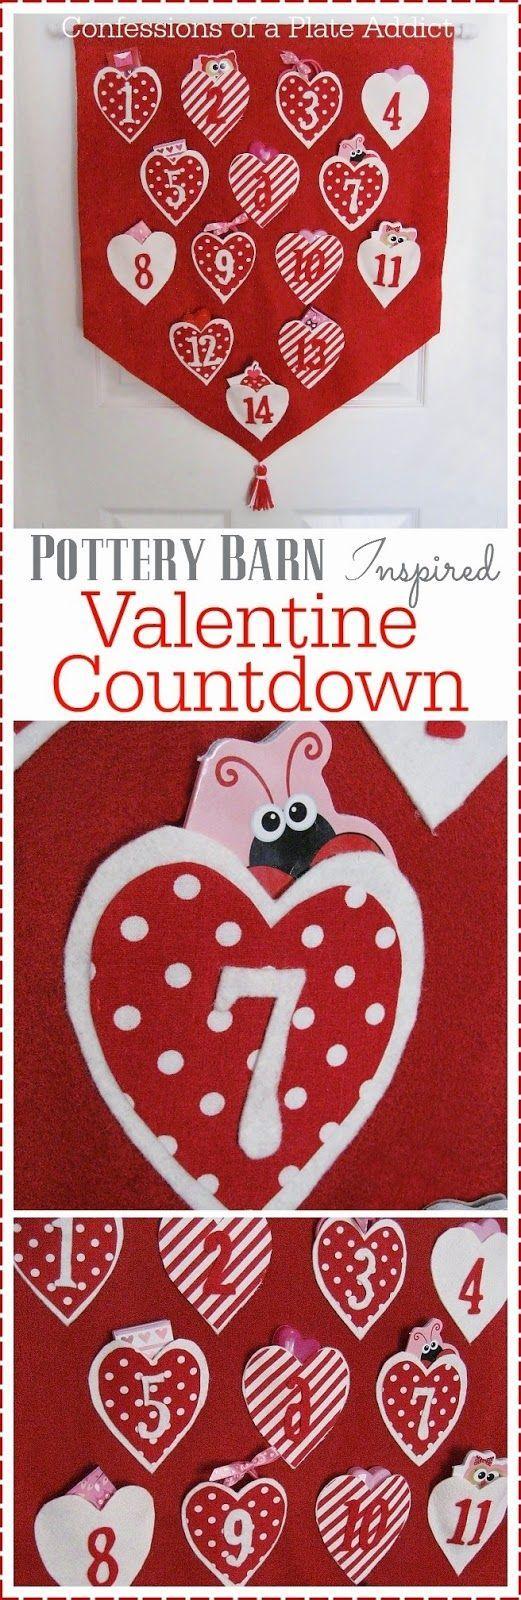 Pottery Barn Inspired No Sew Valentine Countdown Calendar